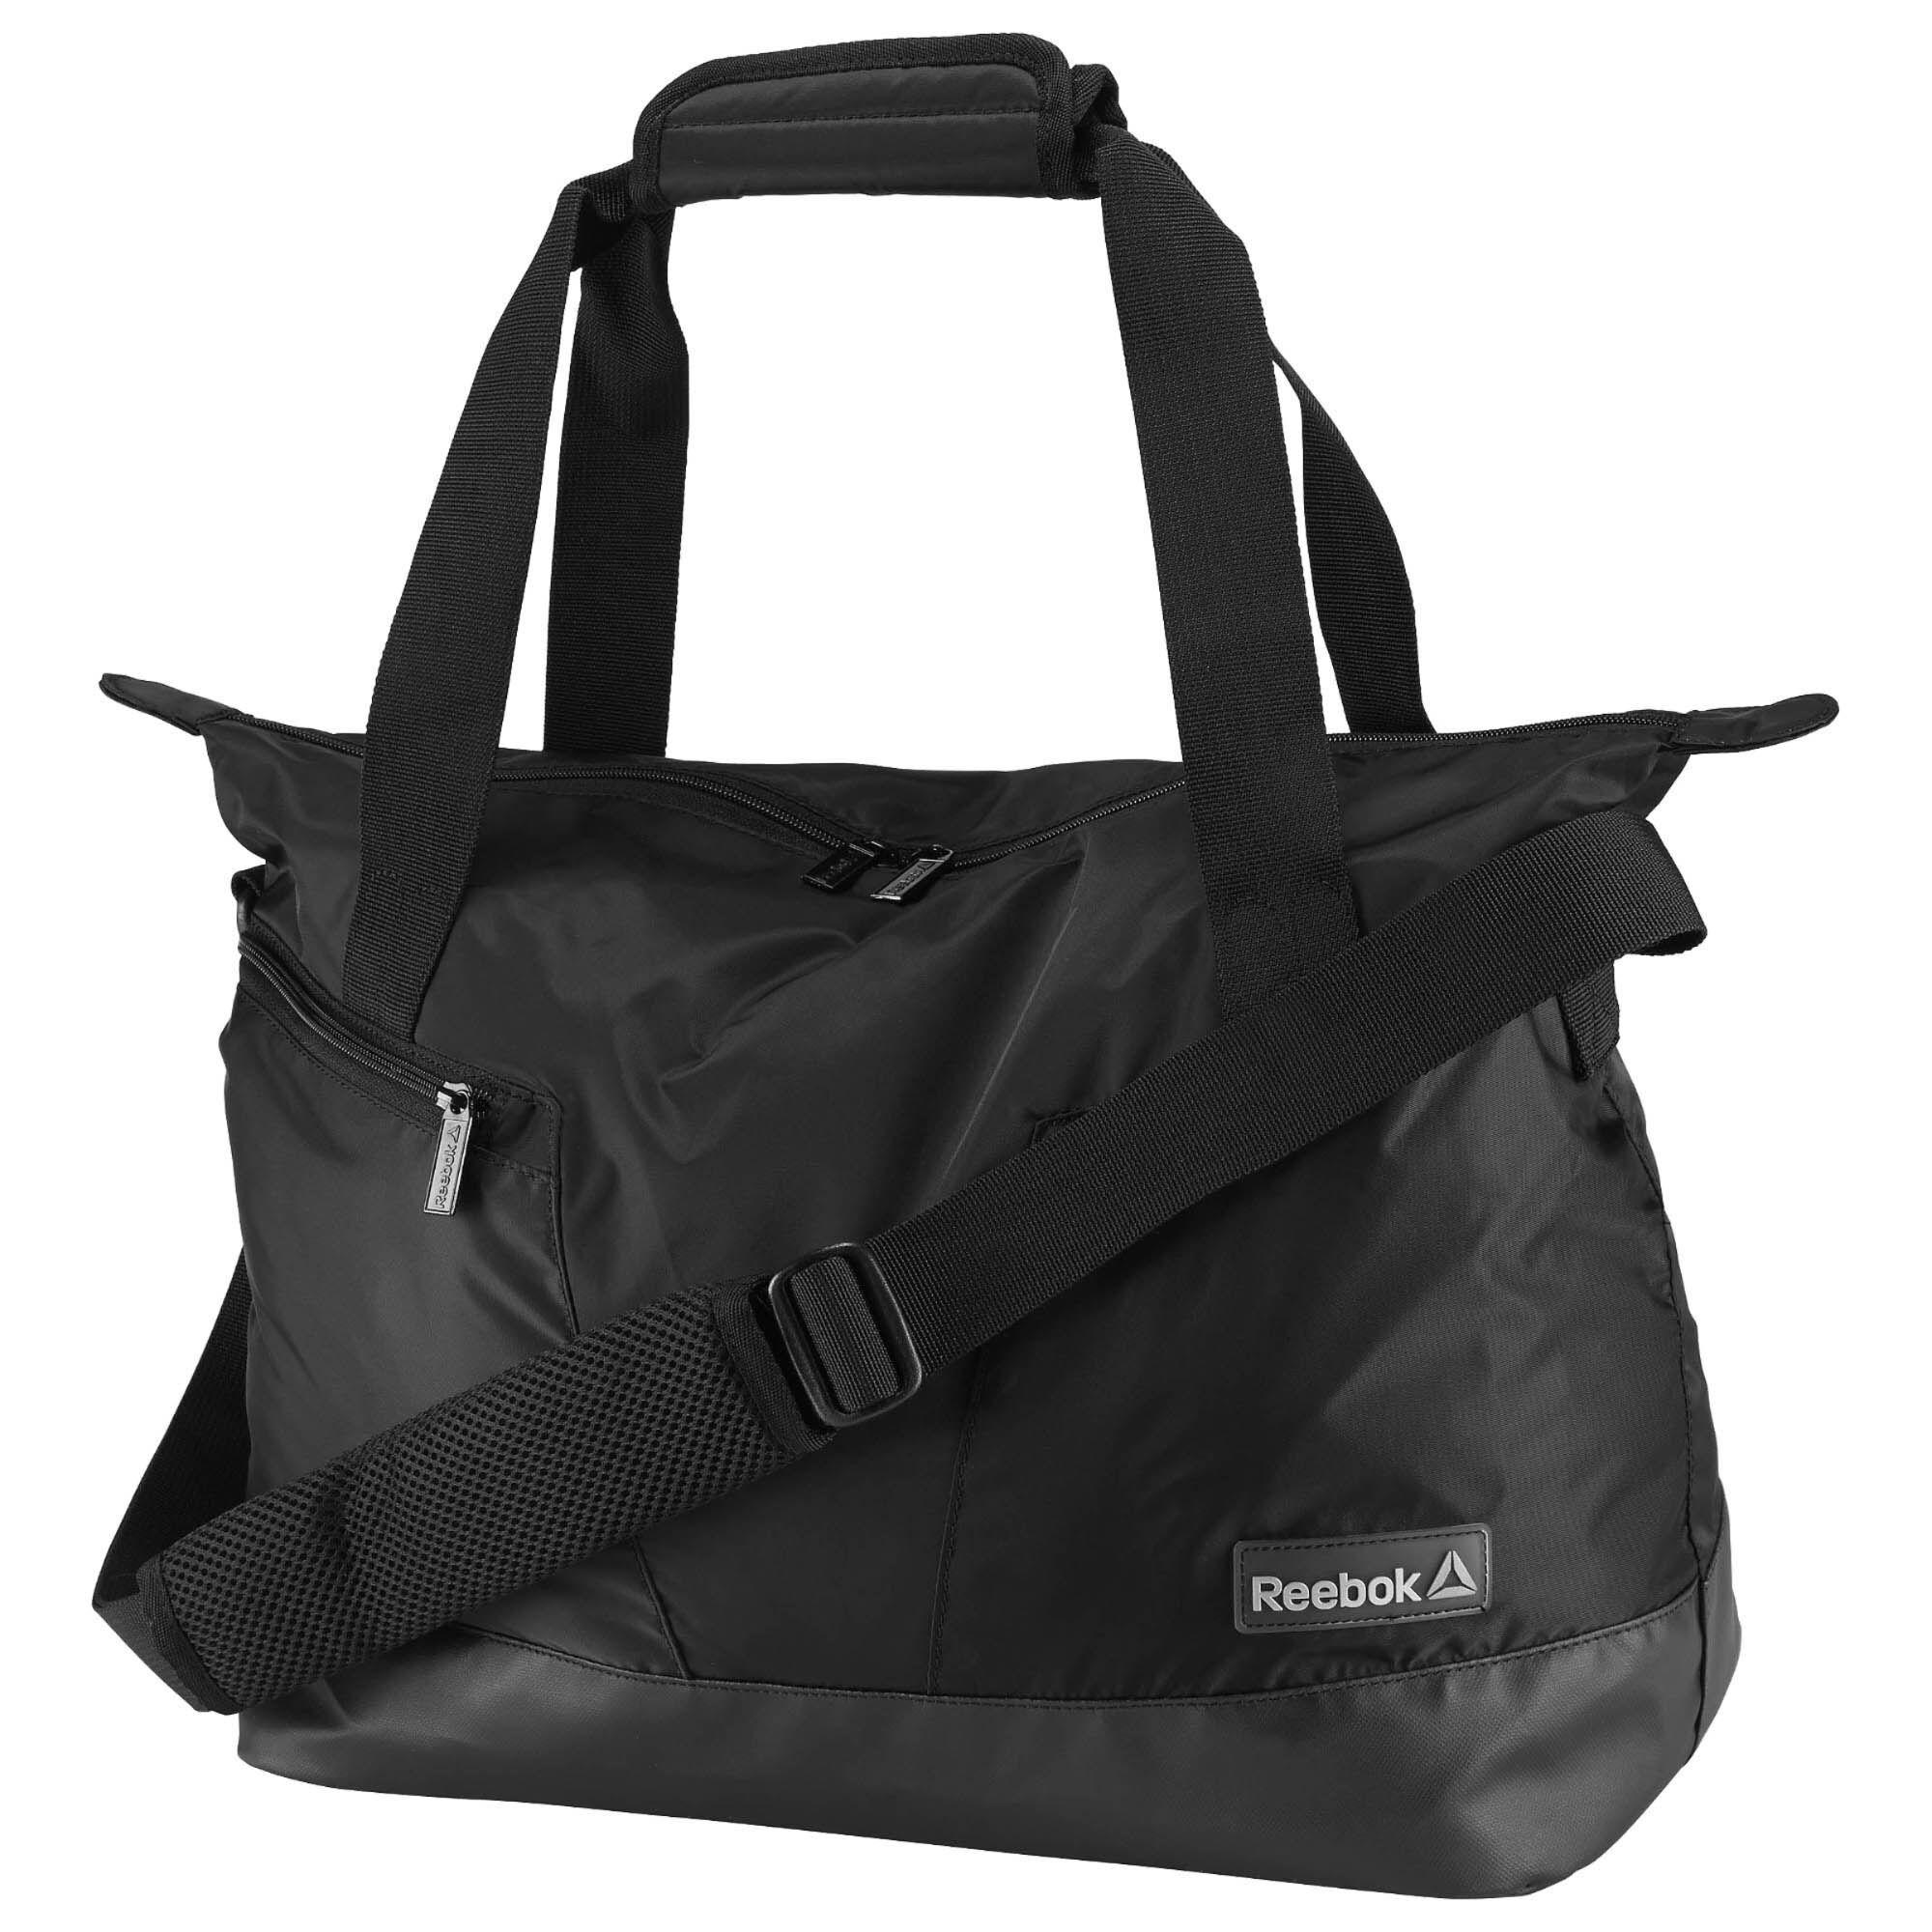 Elegant BG01 Foldable Fitness Bags Women Sport Bag Men Traning Shoulder Gym Bag Outdoor Waterproof Nylon ...